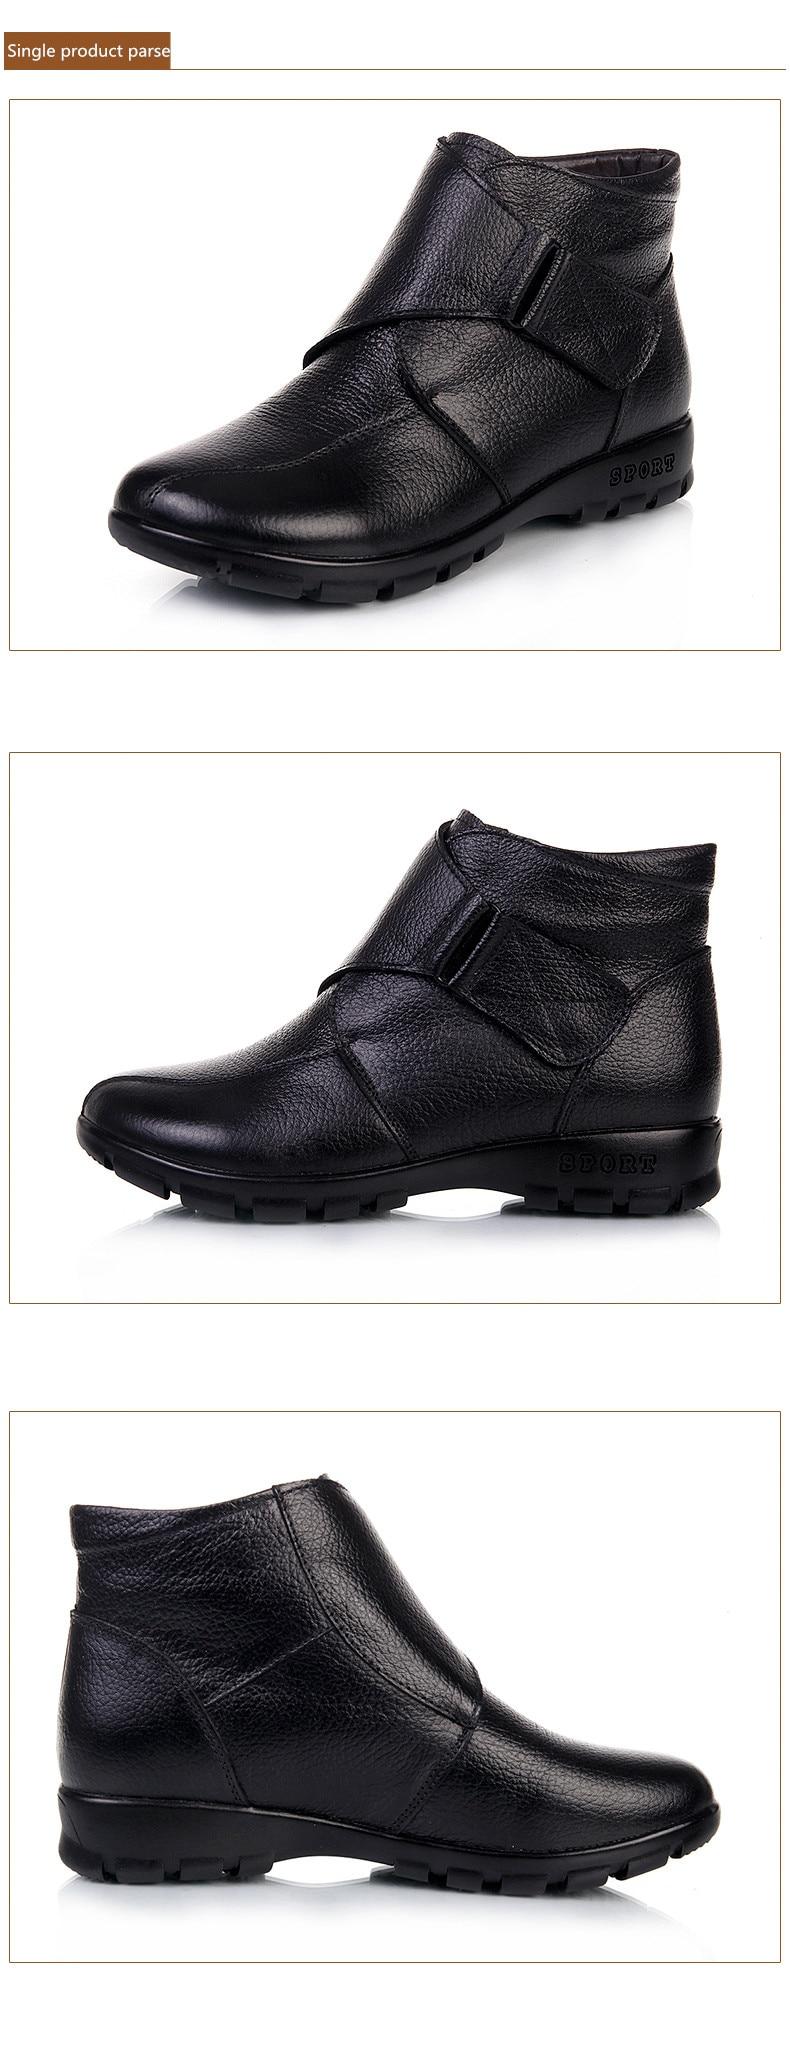 boot shoe service